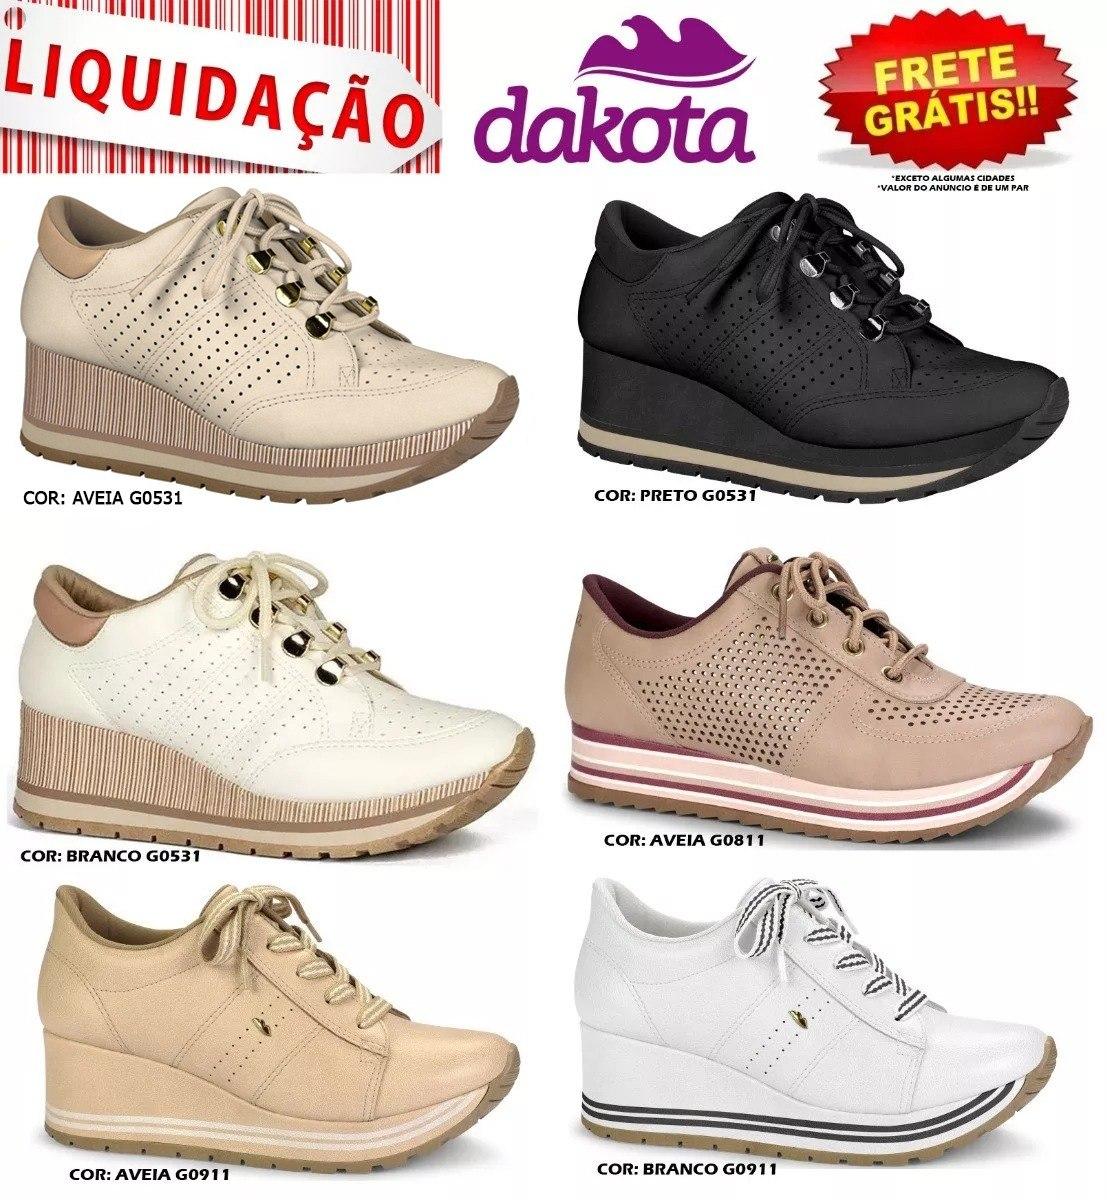 5f5378729b tênis feminino dakota flatform sneaker g0531 g0911 sola alta. Carregando  zoom.